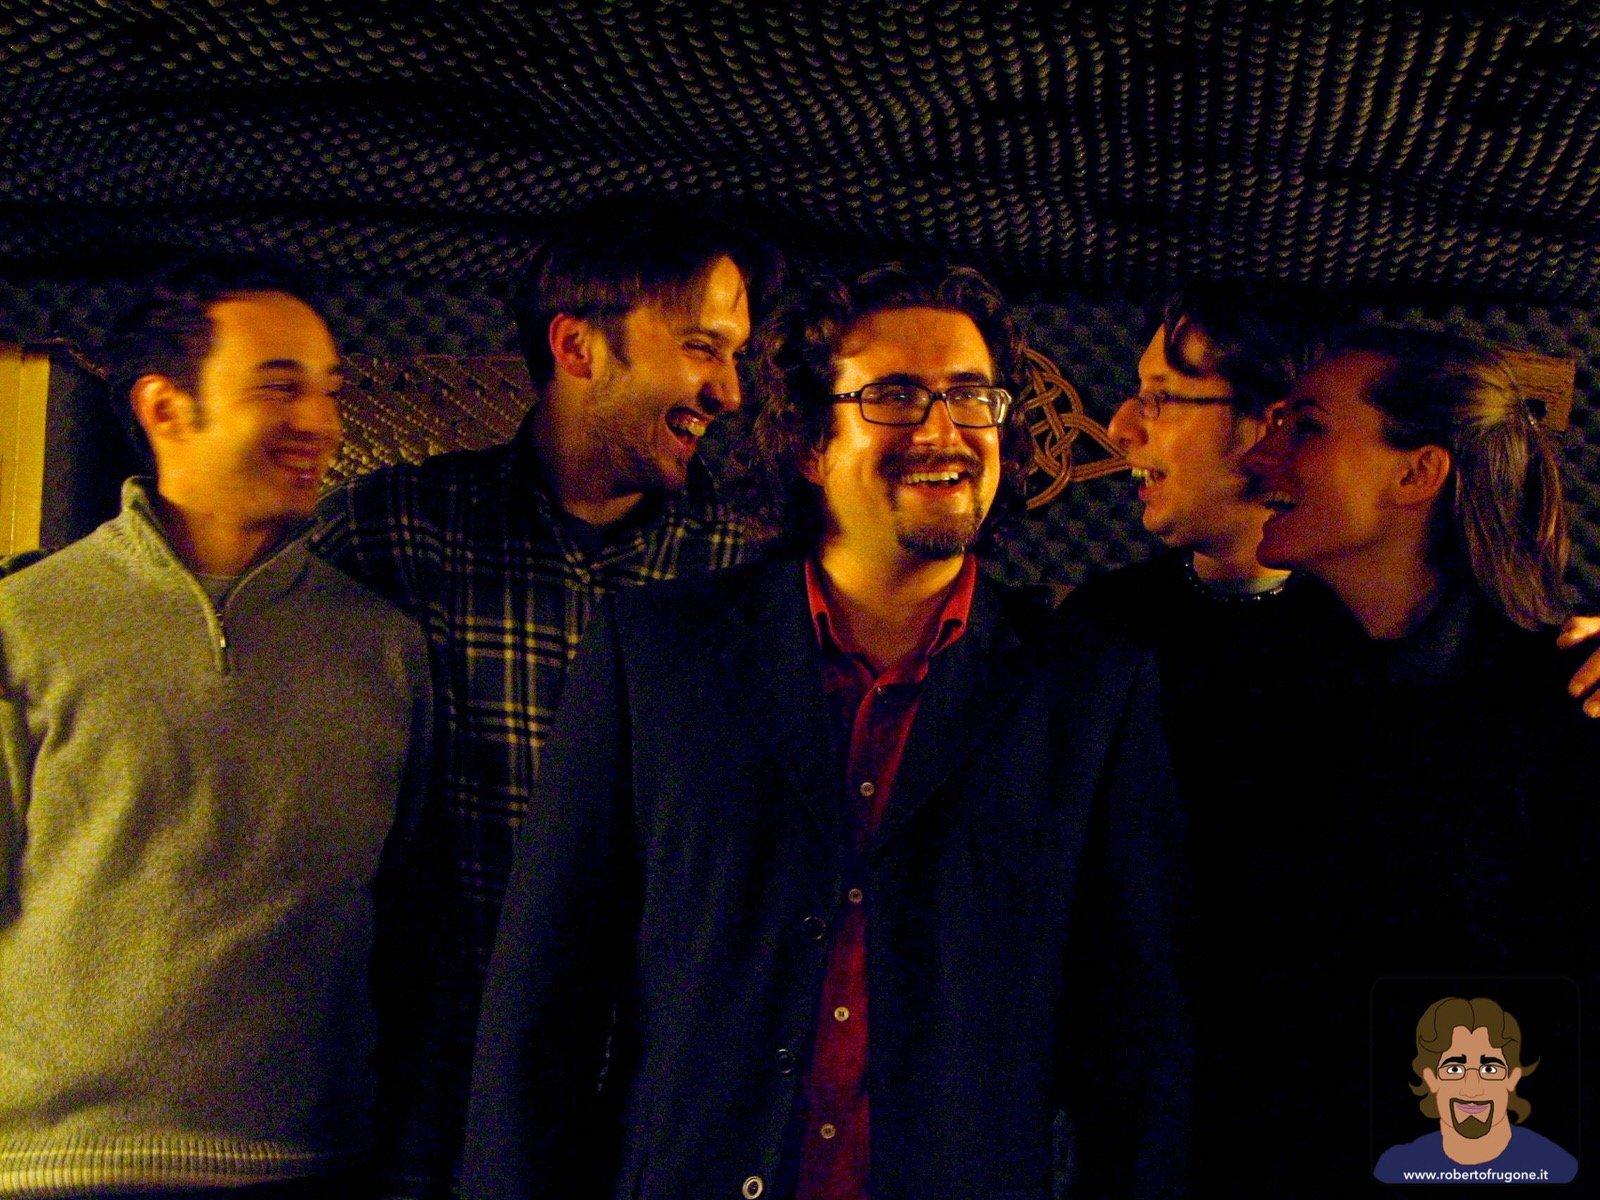 Totem Studio Sala Prove Musicali Casarza Ligure Roberto Frugone Band 2008 – foto Claudia Sanguineti